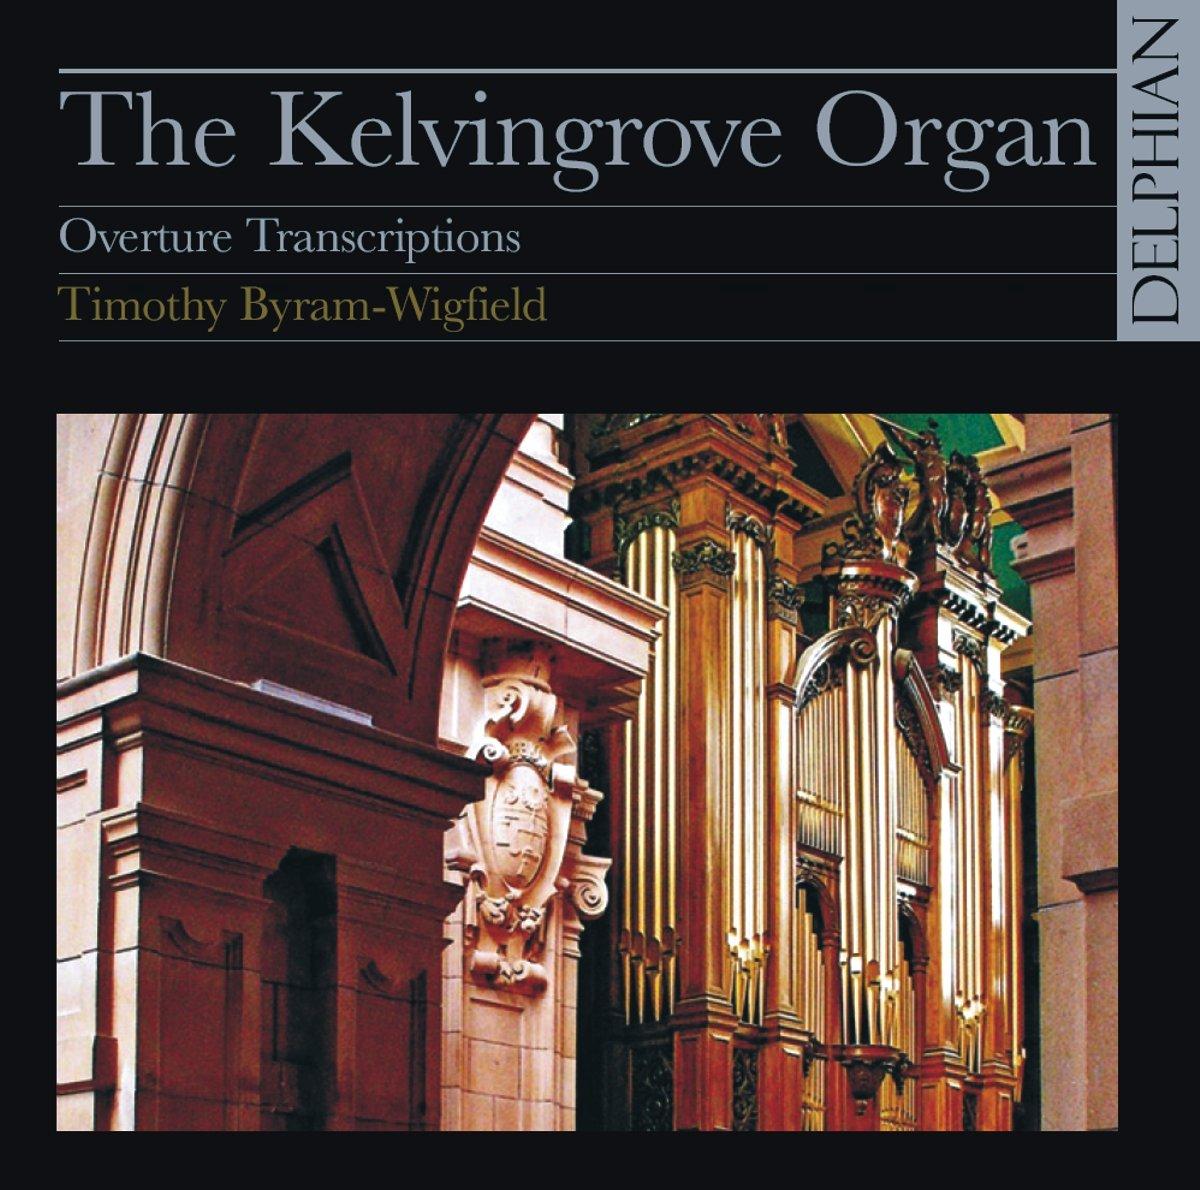 The Kelvingrave Organ by Delphian